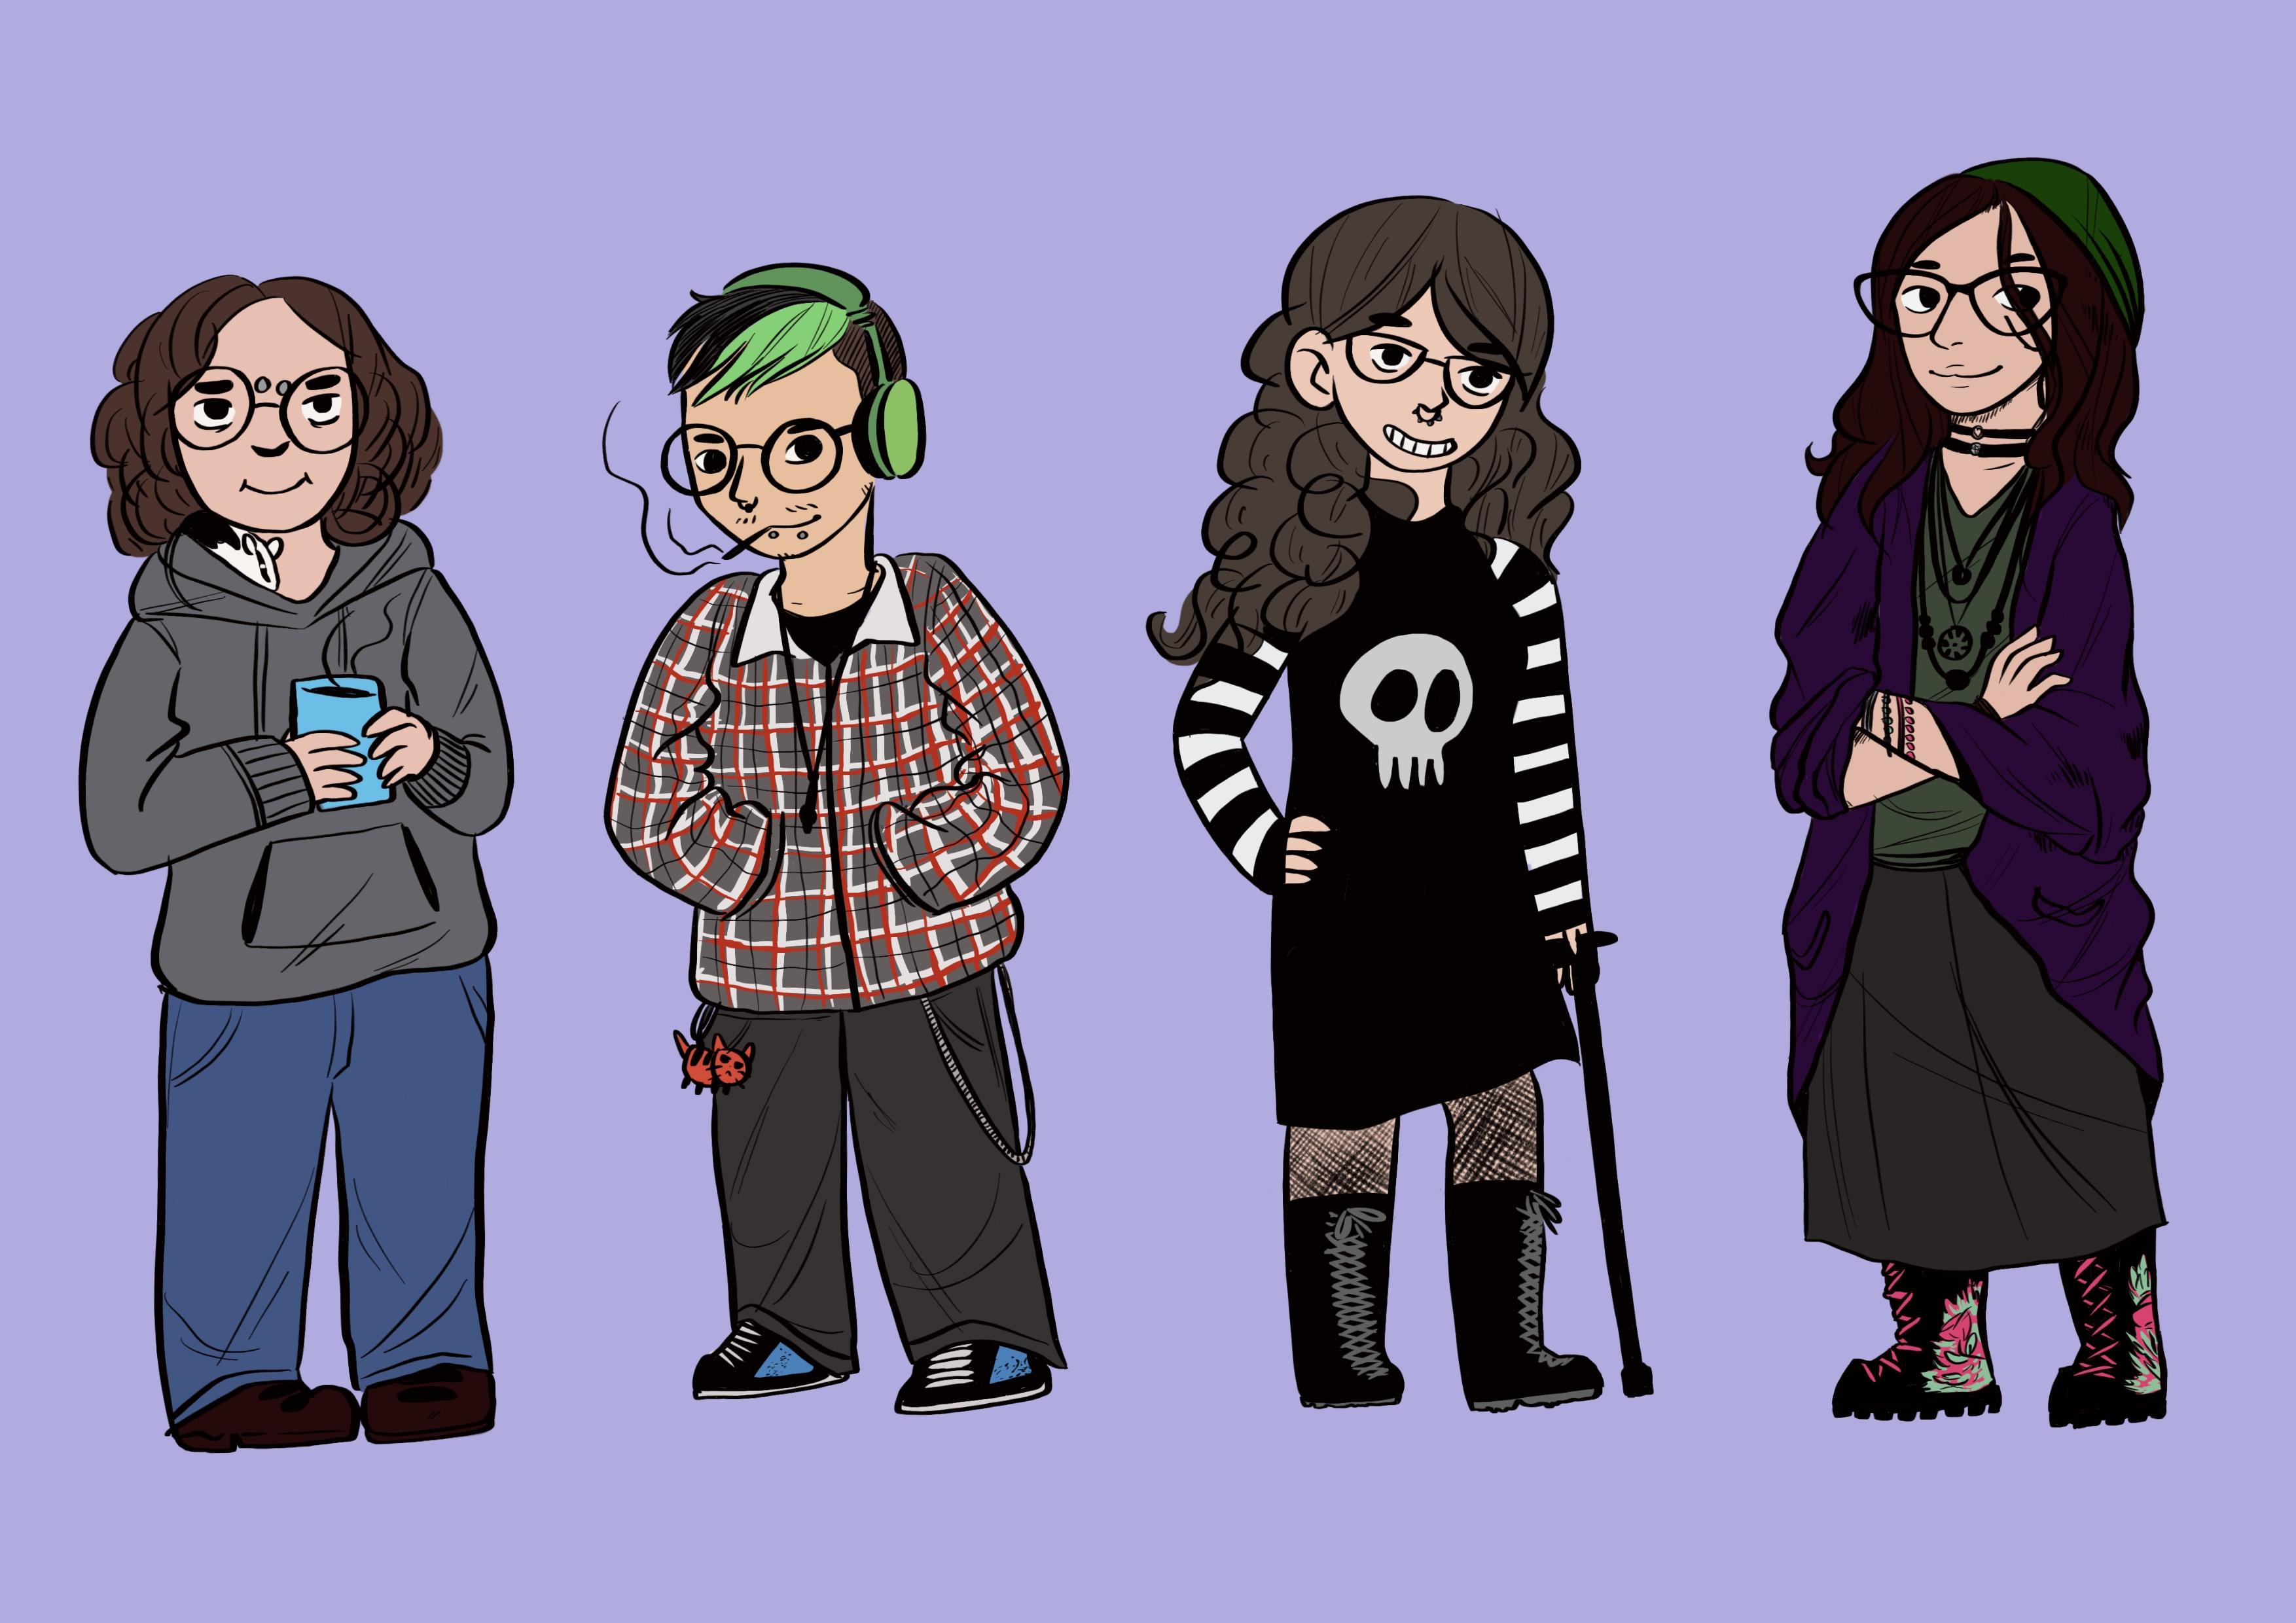 dessin par Calvin Arium de quatres personnes autistes